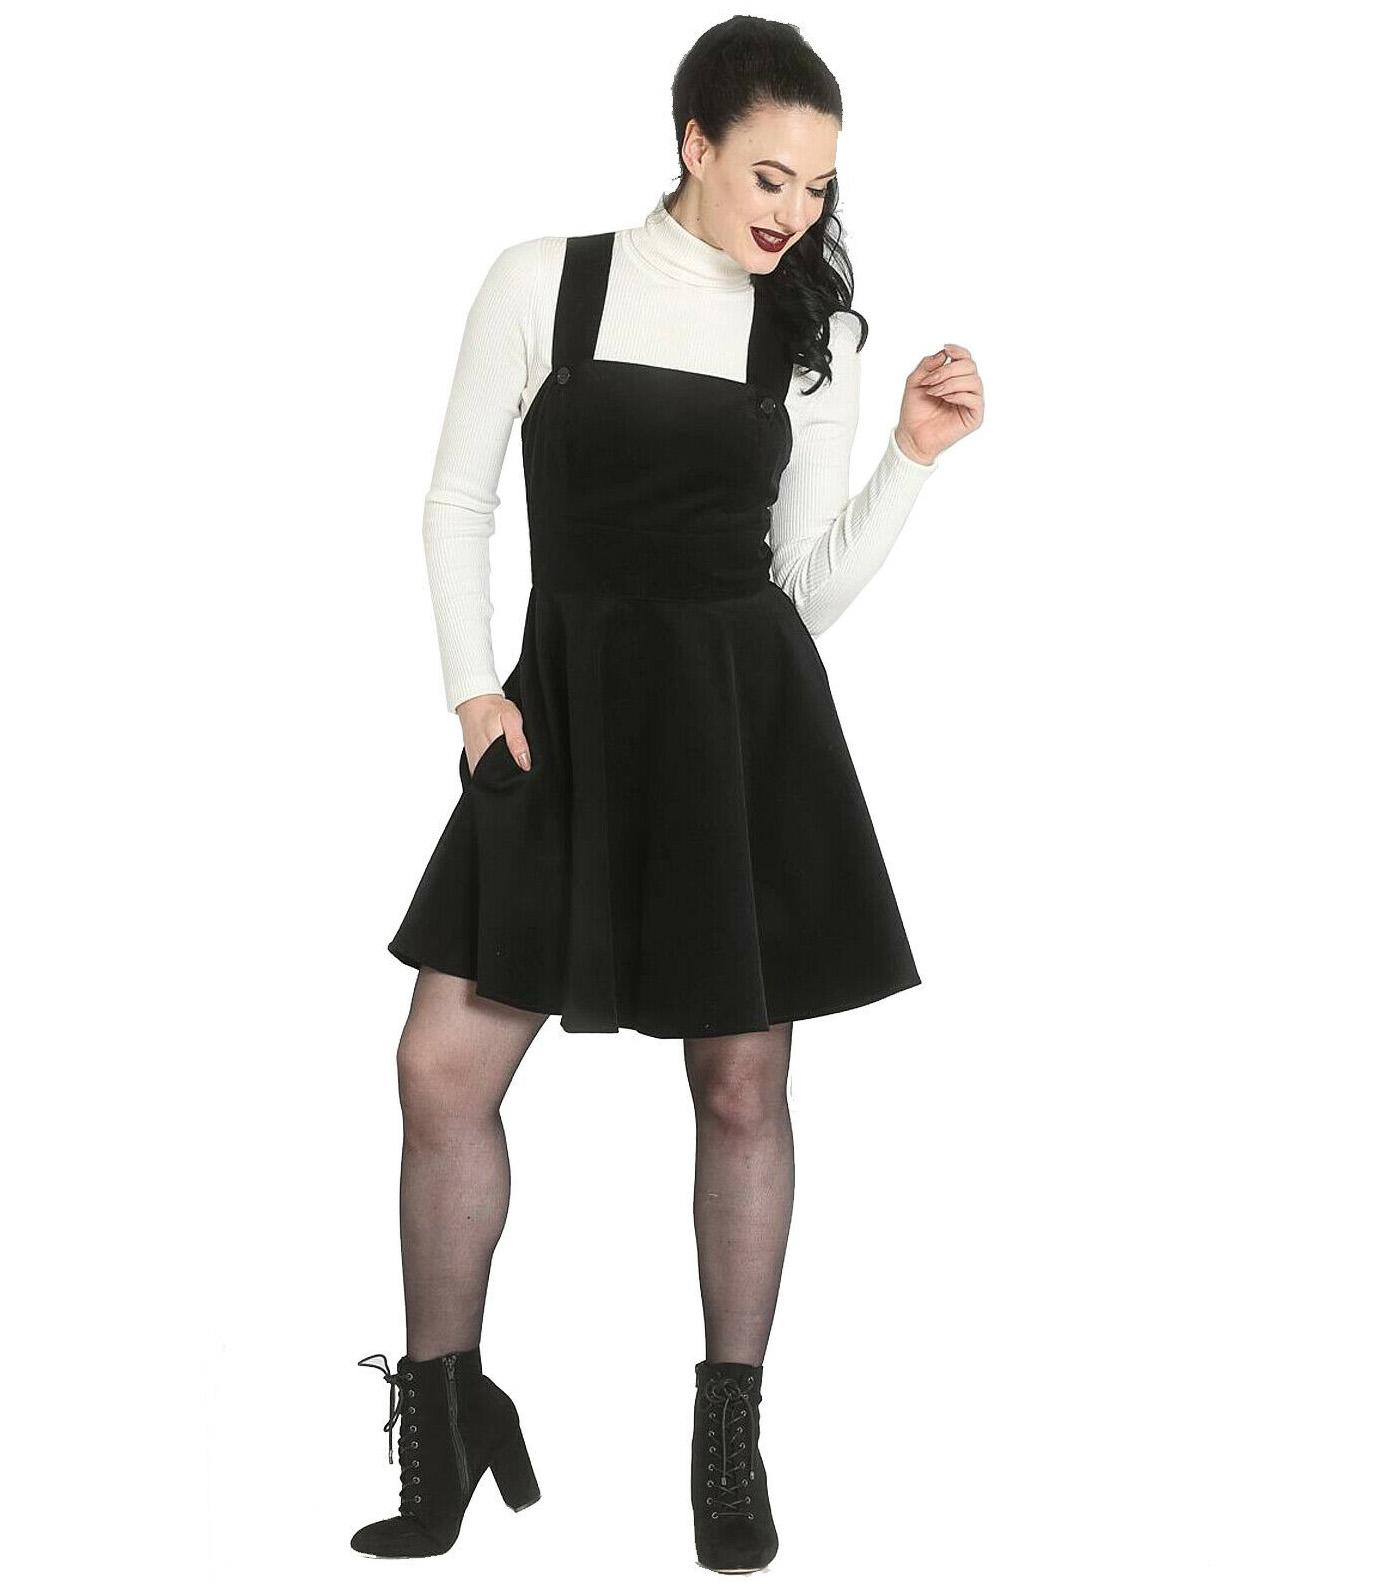 Hell-Bunny-Rockabilly-Corduroy-Mini-Dress-WONDER-YEARS-Pinafore-Black-All-Sizes thumbnail 11